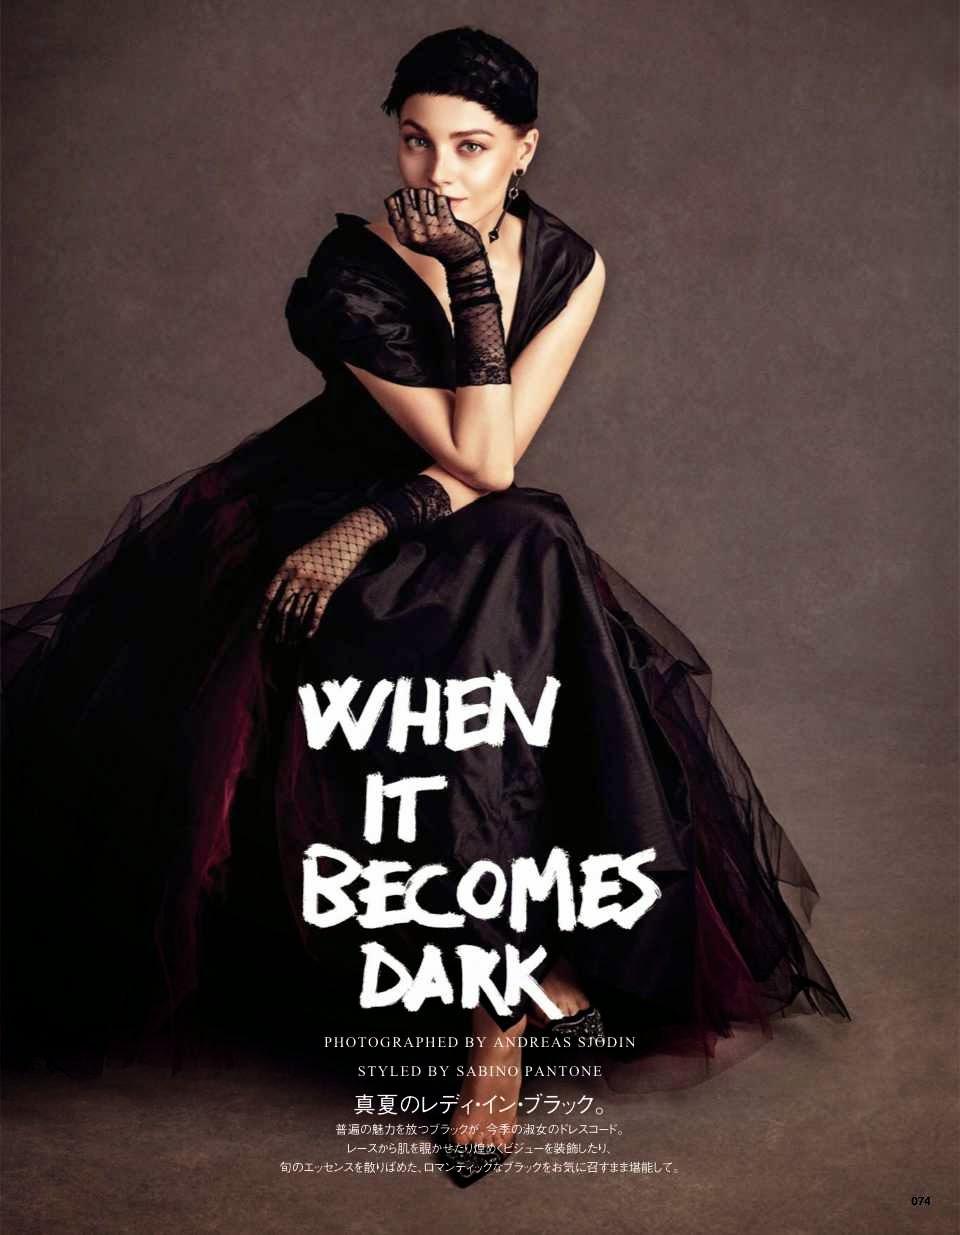 Anna Jagodzinska by Andreas Sjodin for Vogue Japan July 2014